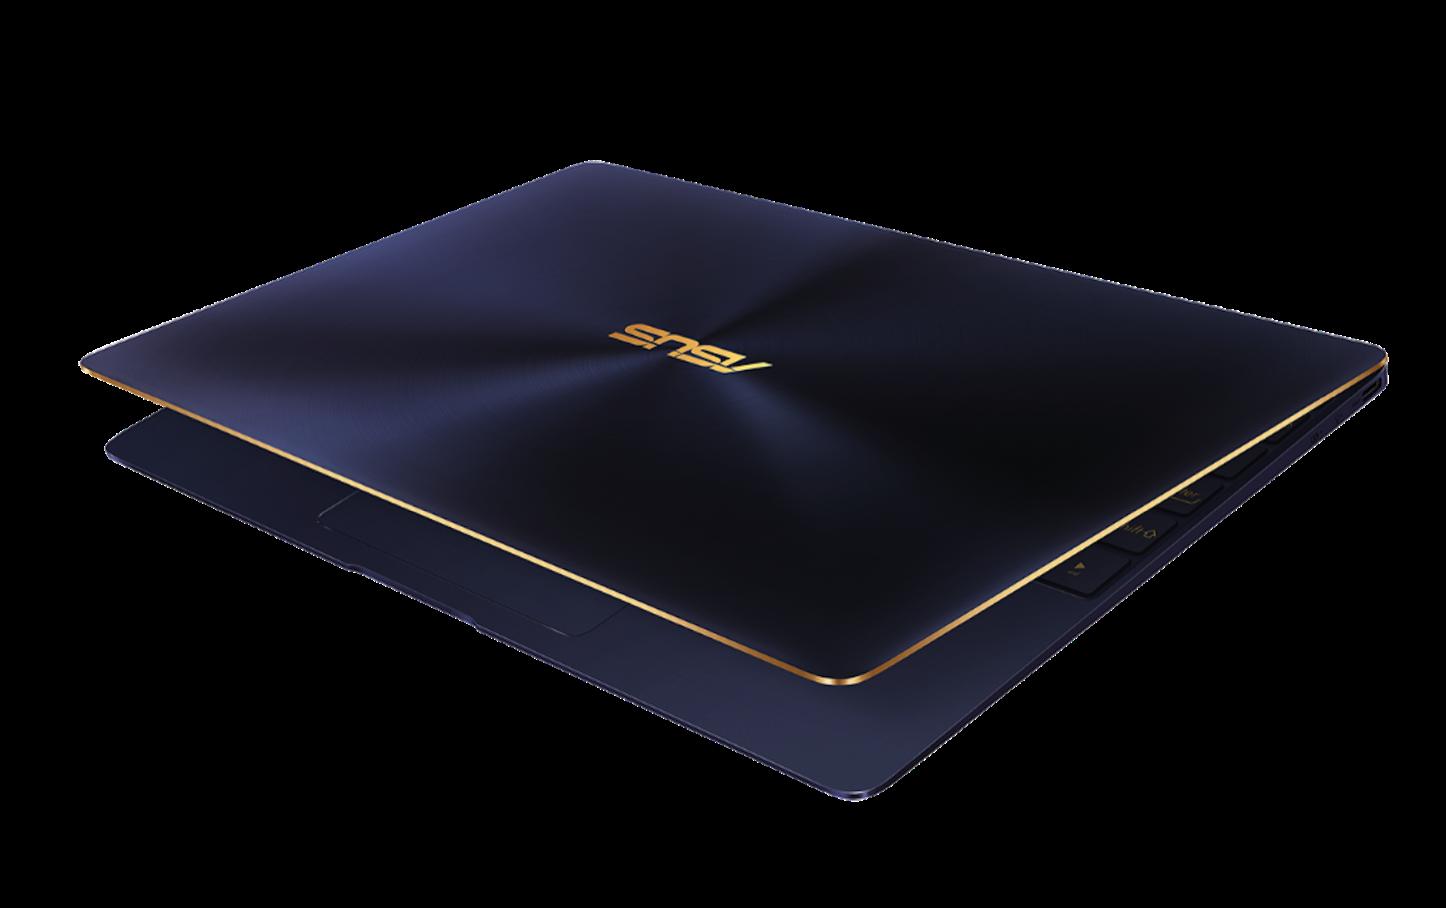 ASUS-ZenBook-3_UX390_unibody-design-wity-aerospace-grade-alloy.png